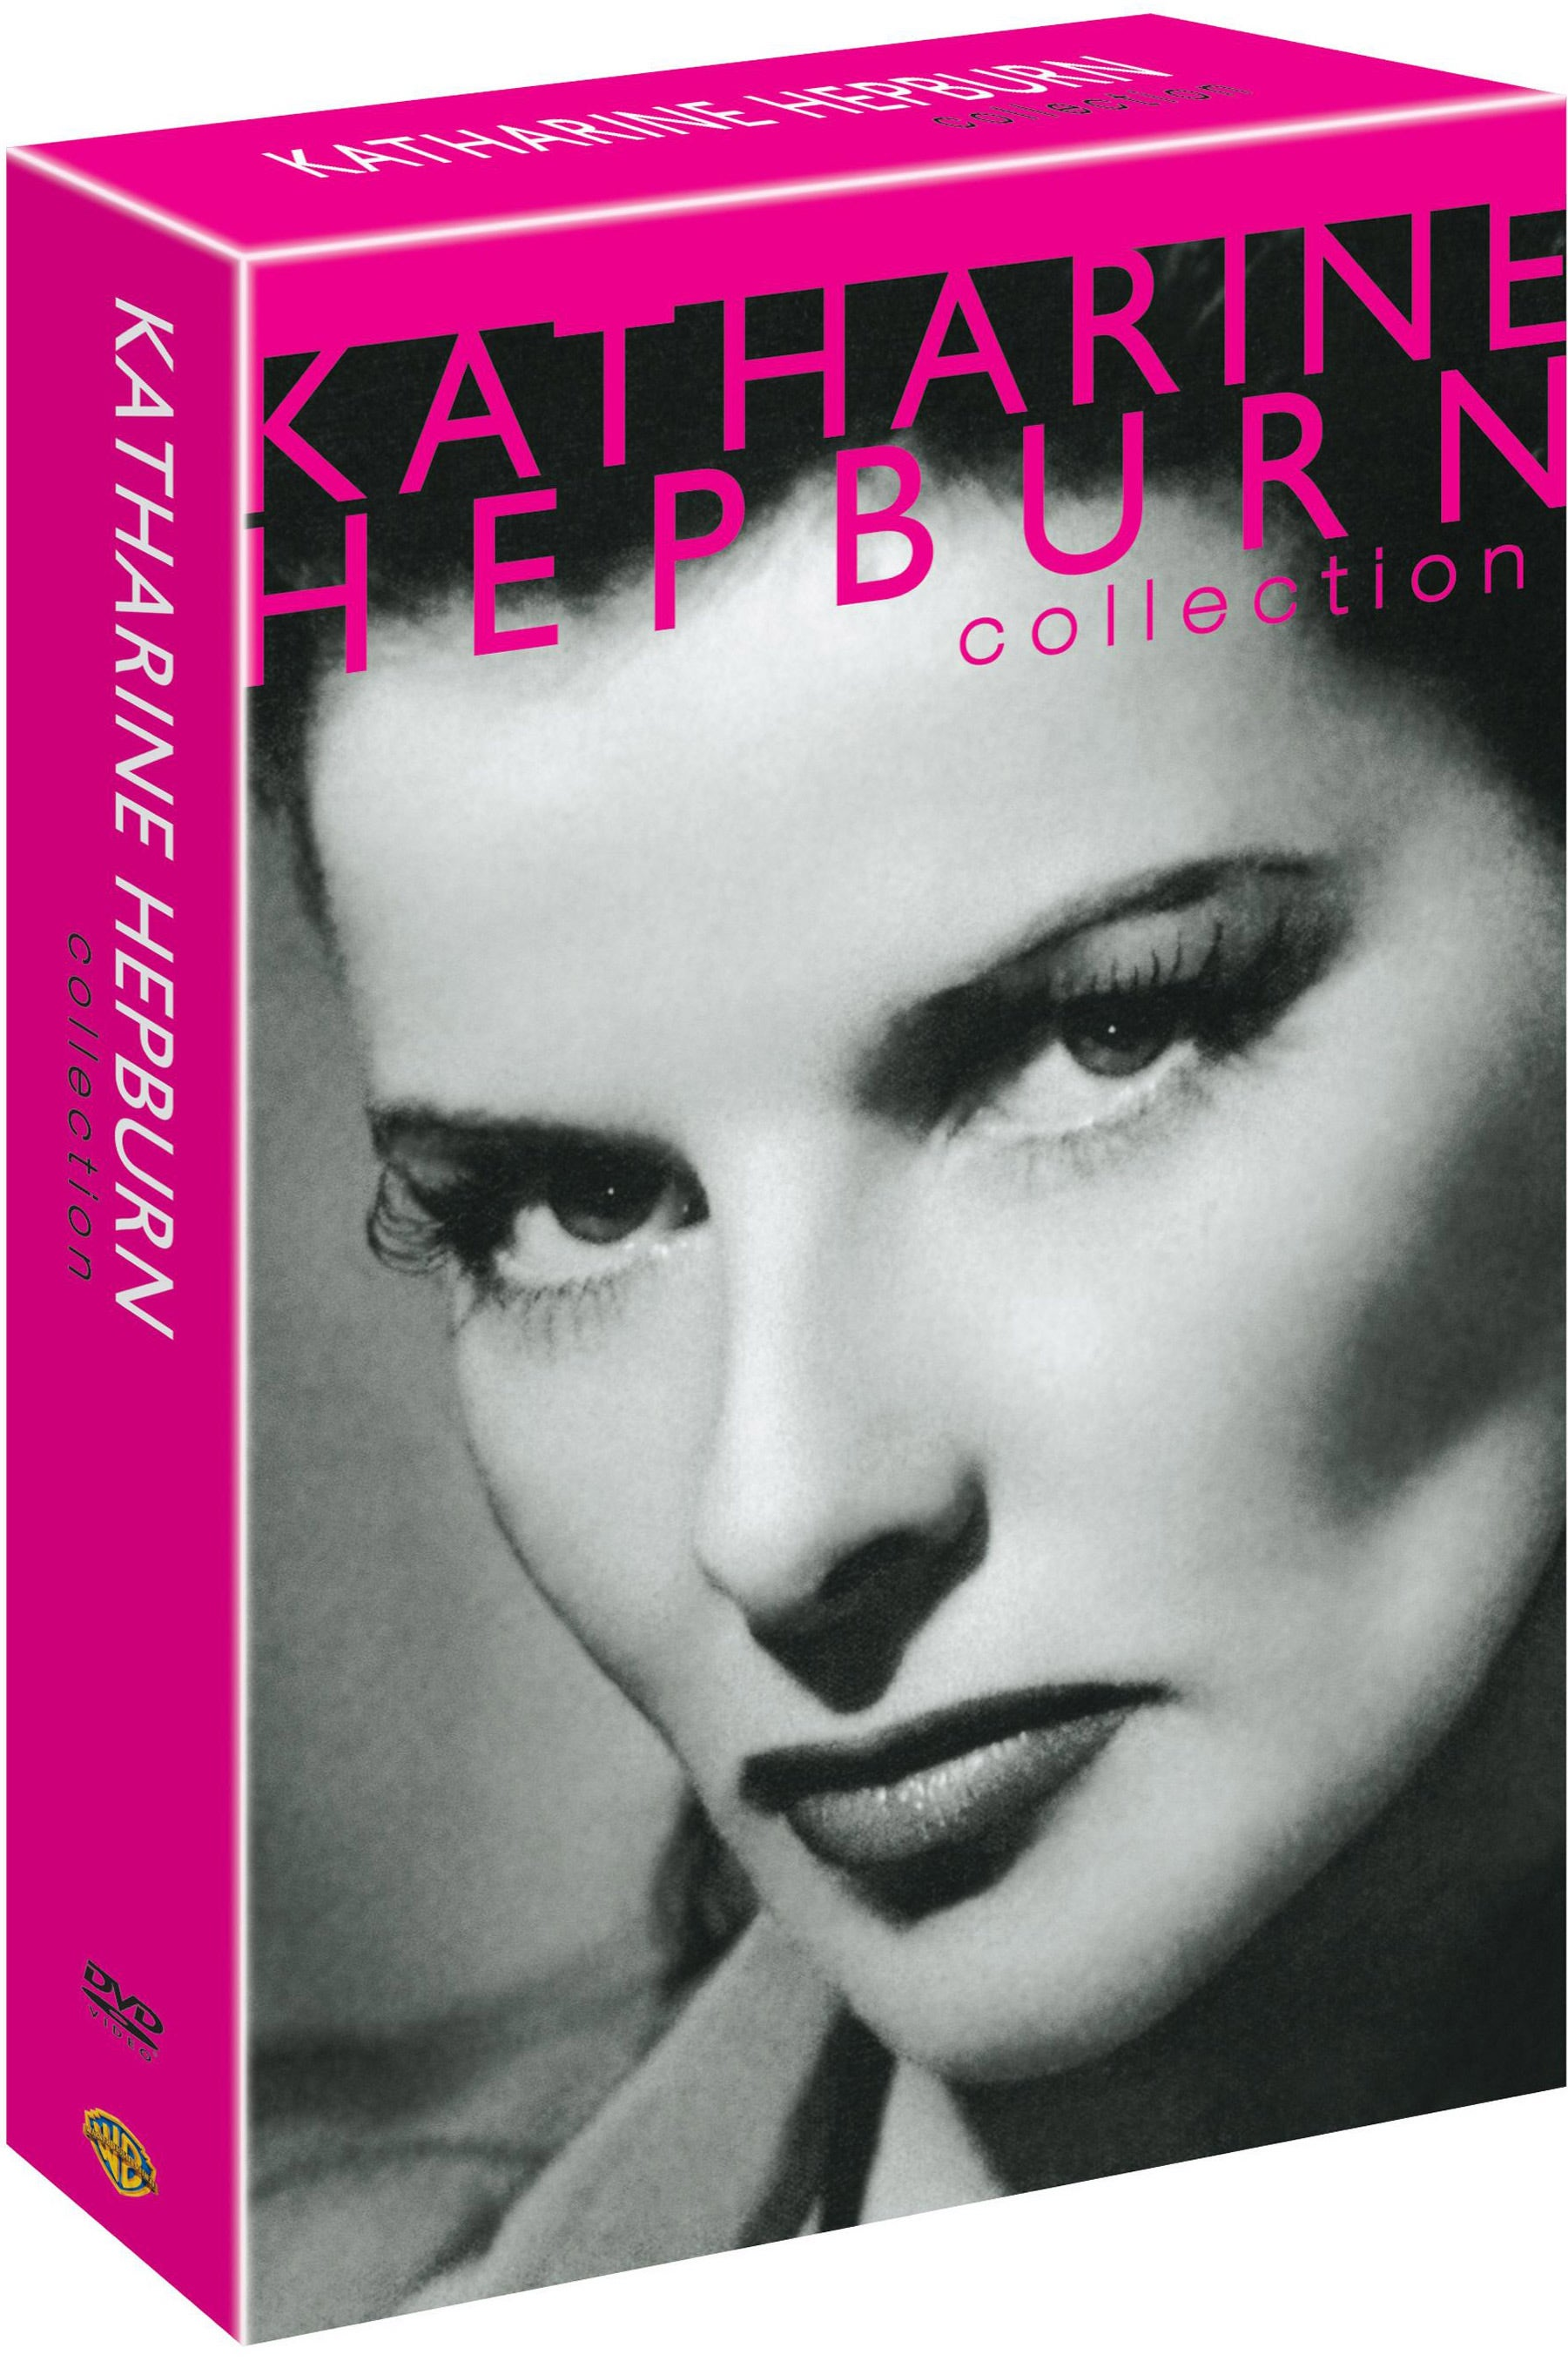 Katharine Hepburn 100th Anniversary Collection (DVD)